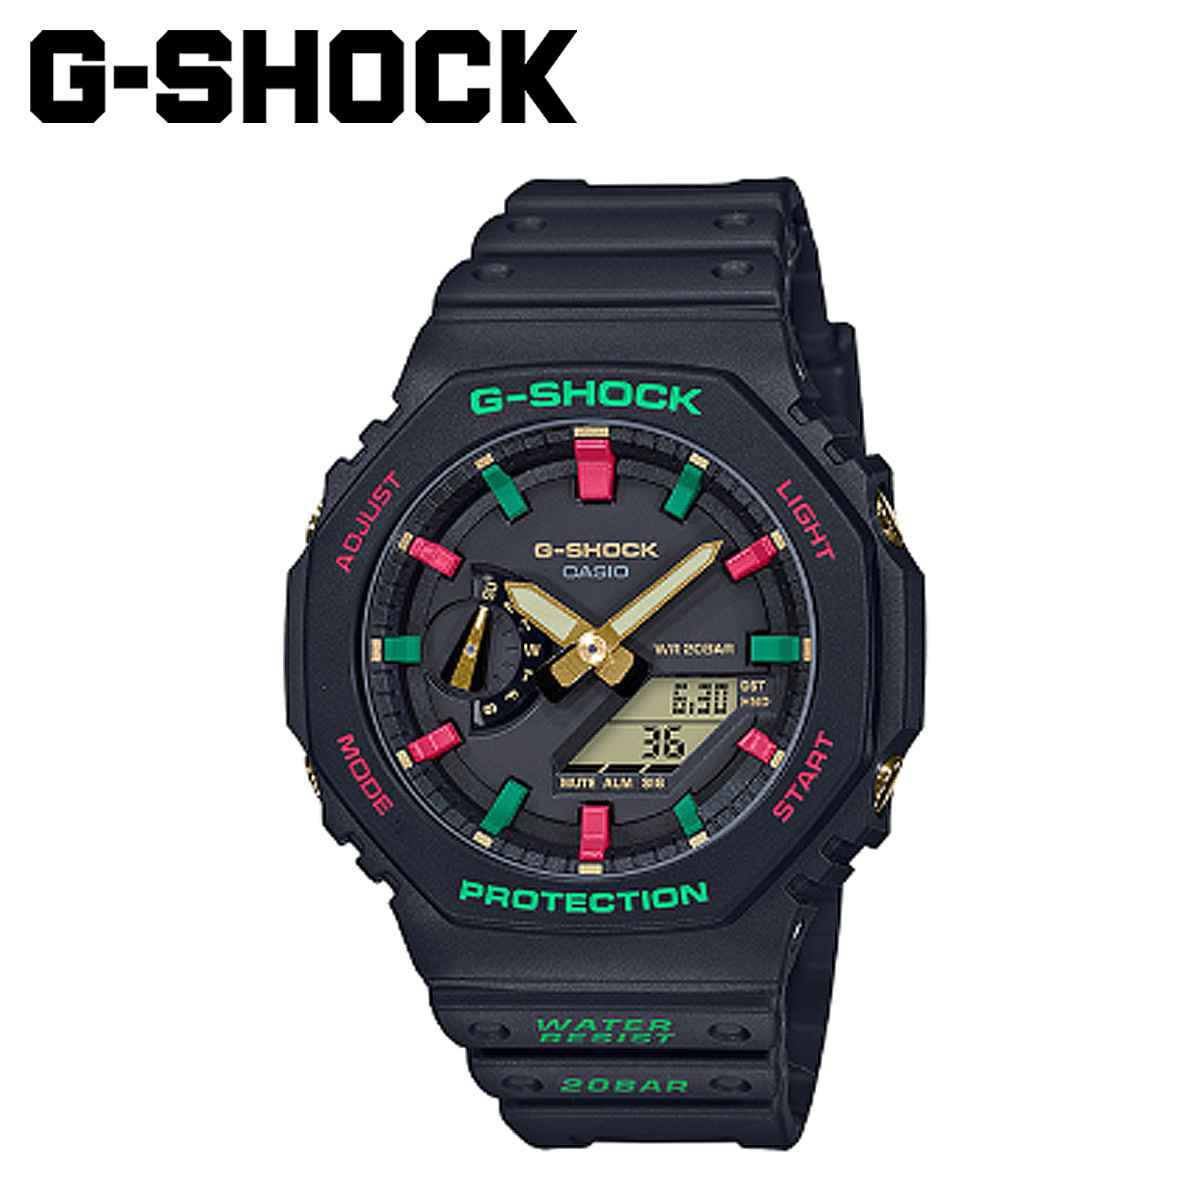 CASIO カシオ G-SHOCK 腕時計 GA-2100TH-1AJF THROWBACK 1990S ジーショック Gショック G-ショック メンズ レディース ブラック 黒